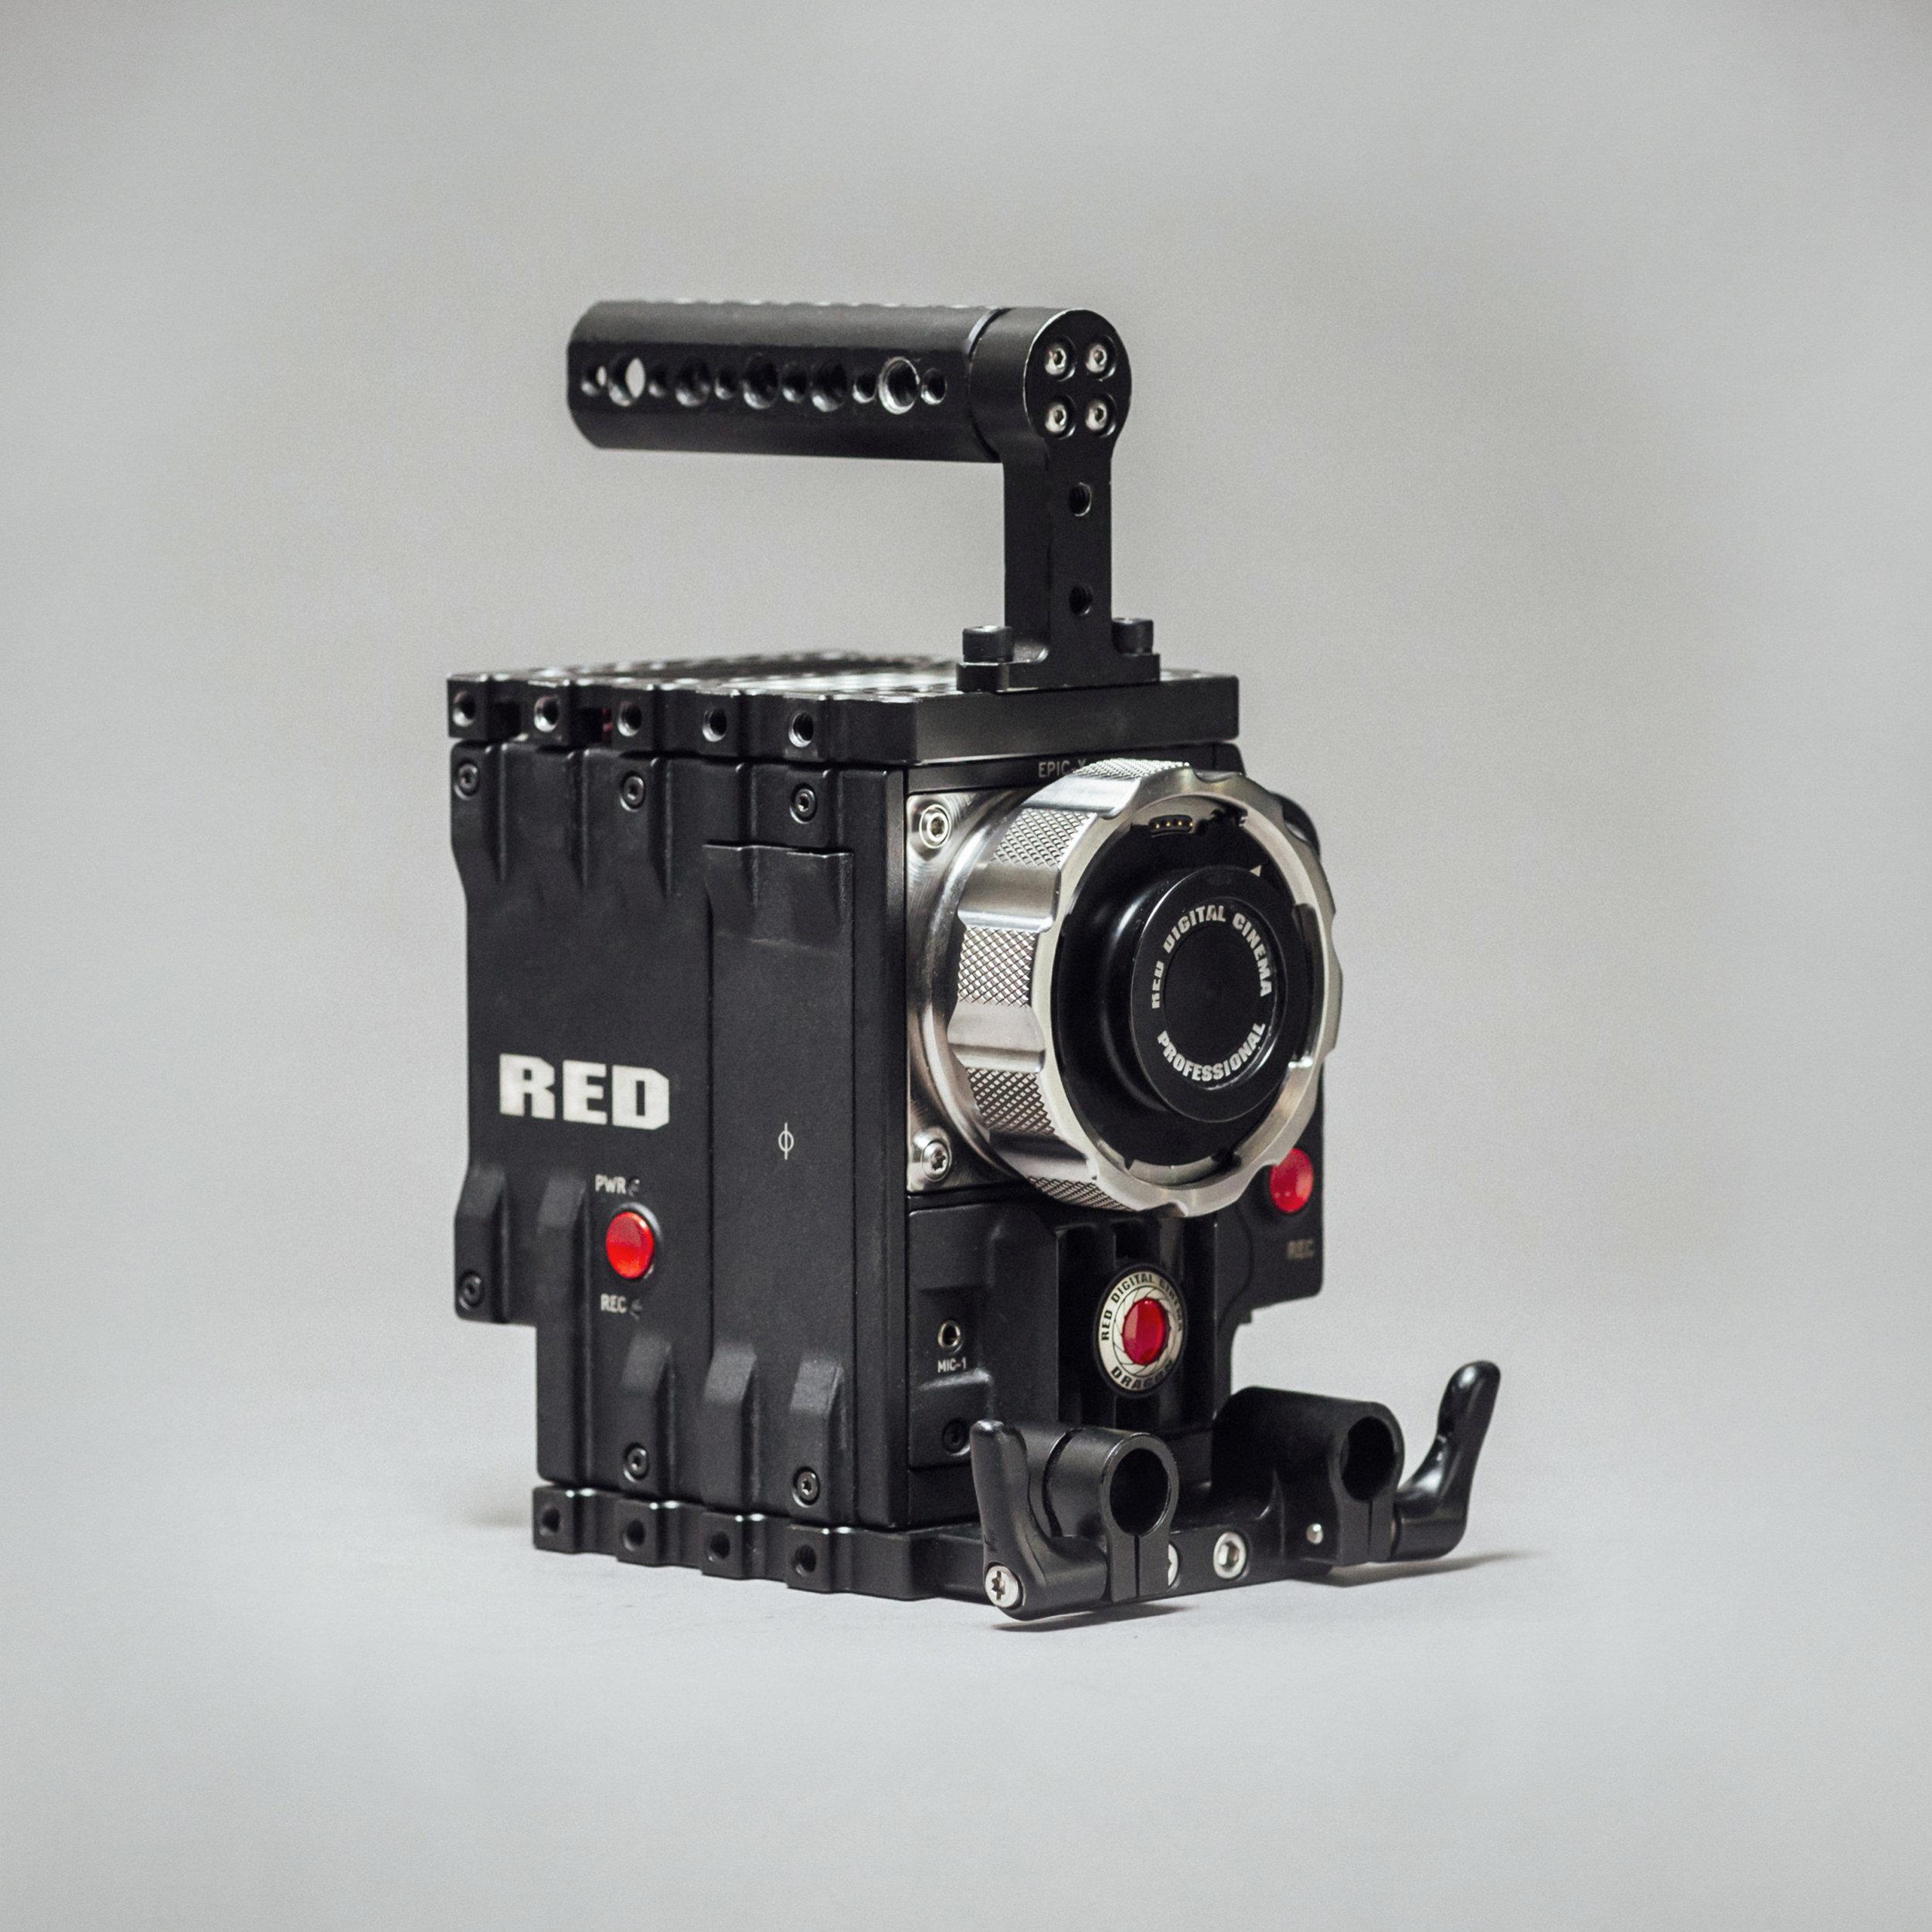 Wonderful Red Epic Dragon Camera Department Cine Equipment Rentals Red Epic Dragon Movies Red Epic Dragon Manual dpreview Red Epic Dragon